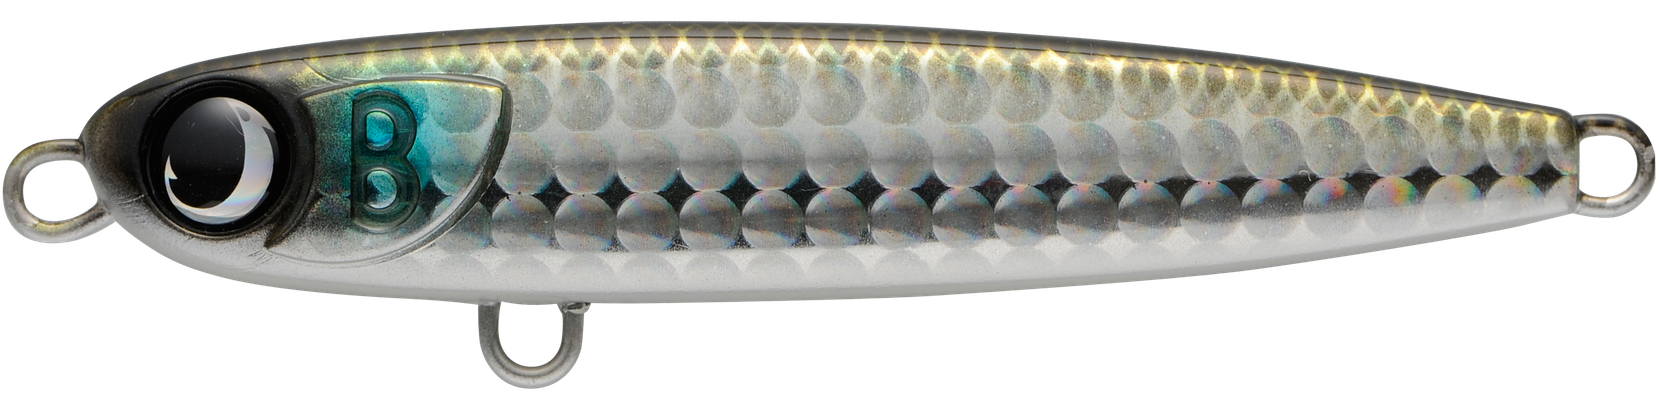 03-Mallet Lens